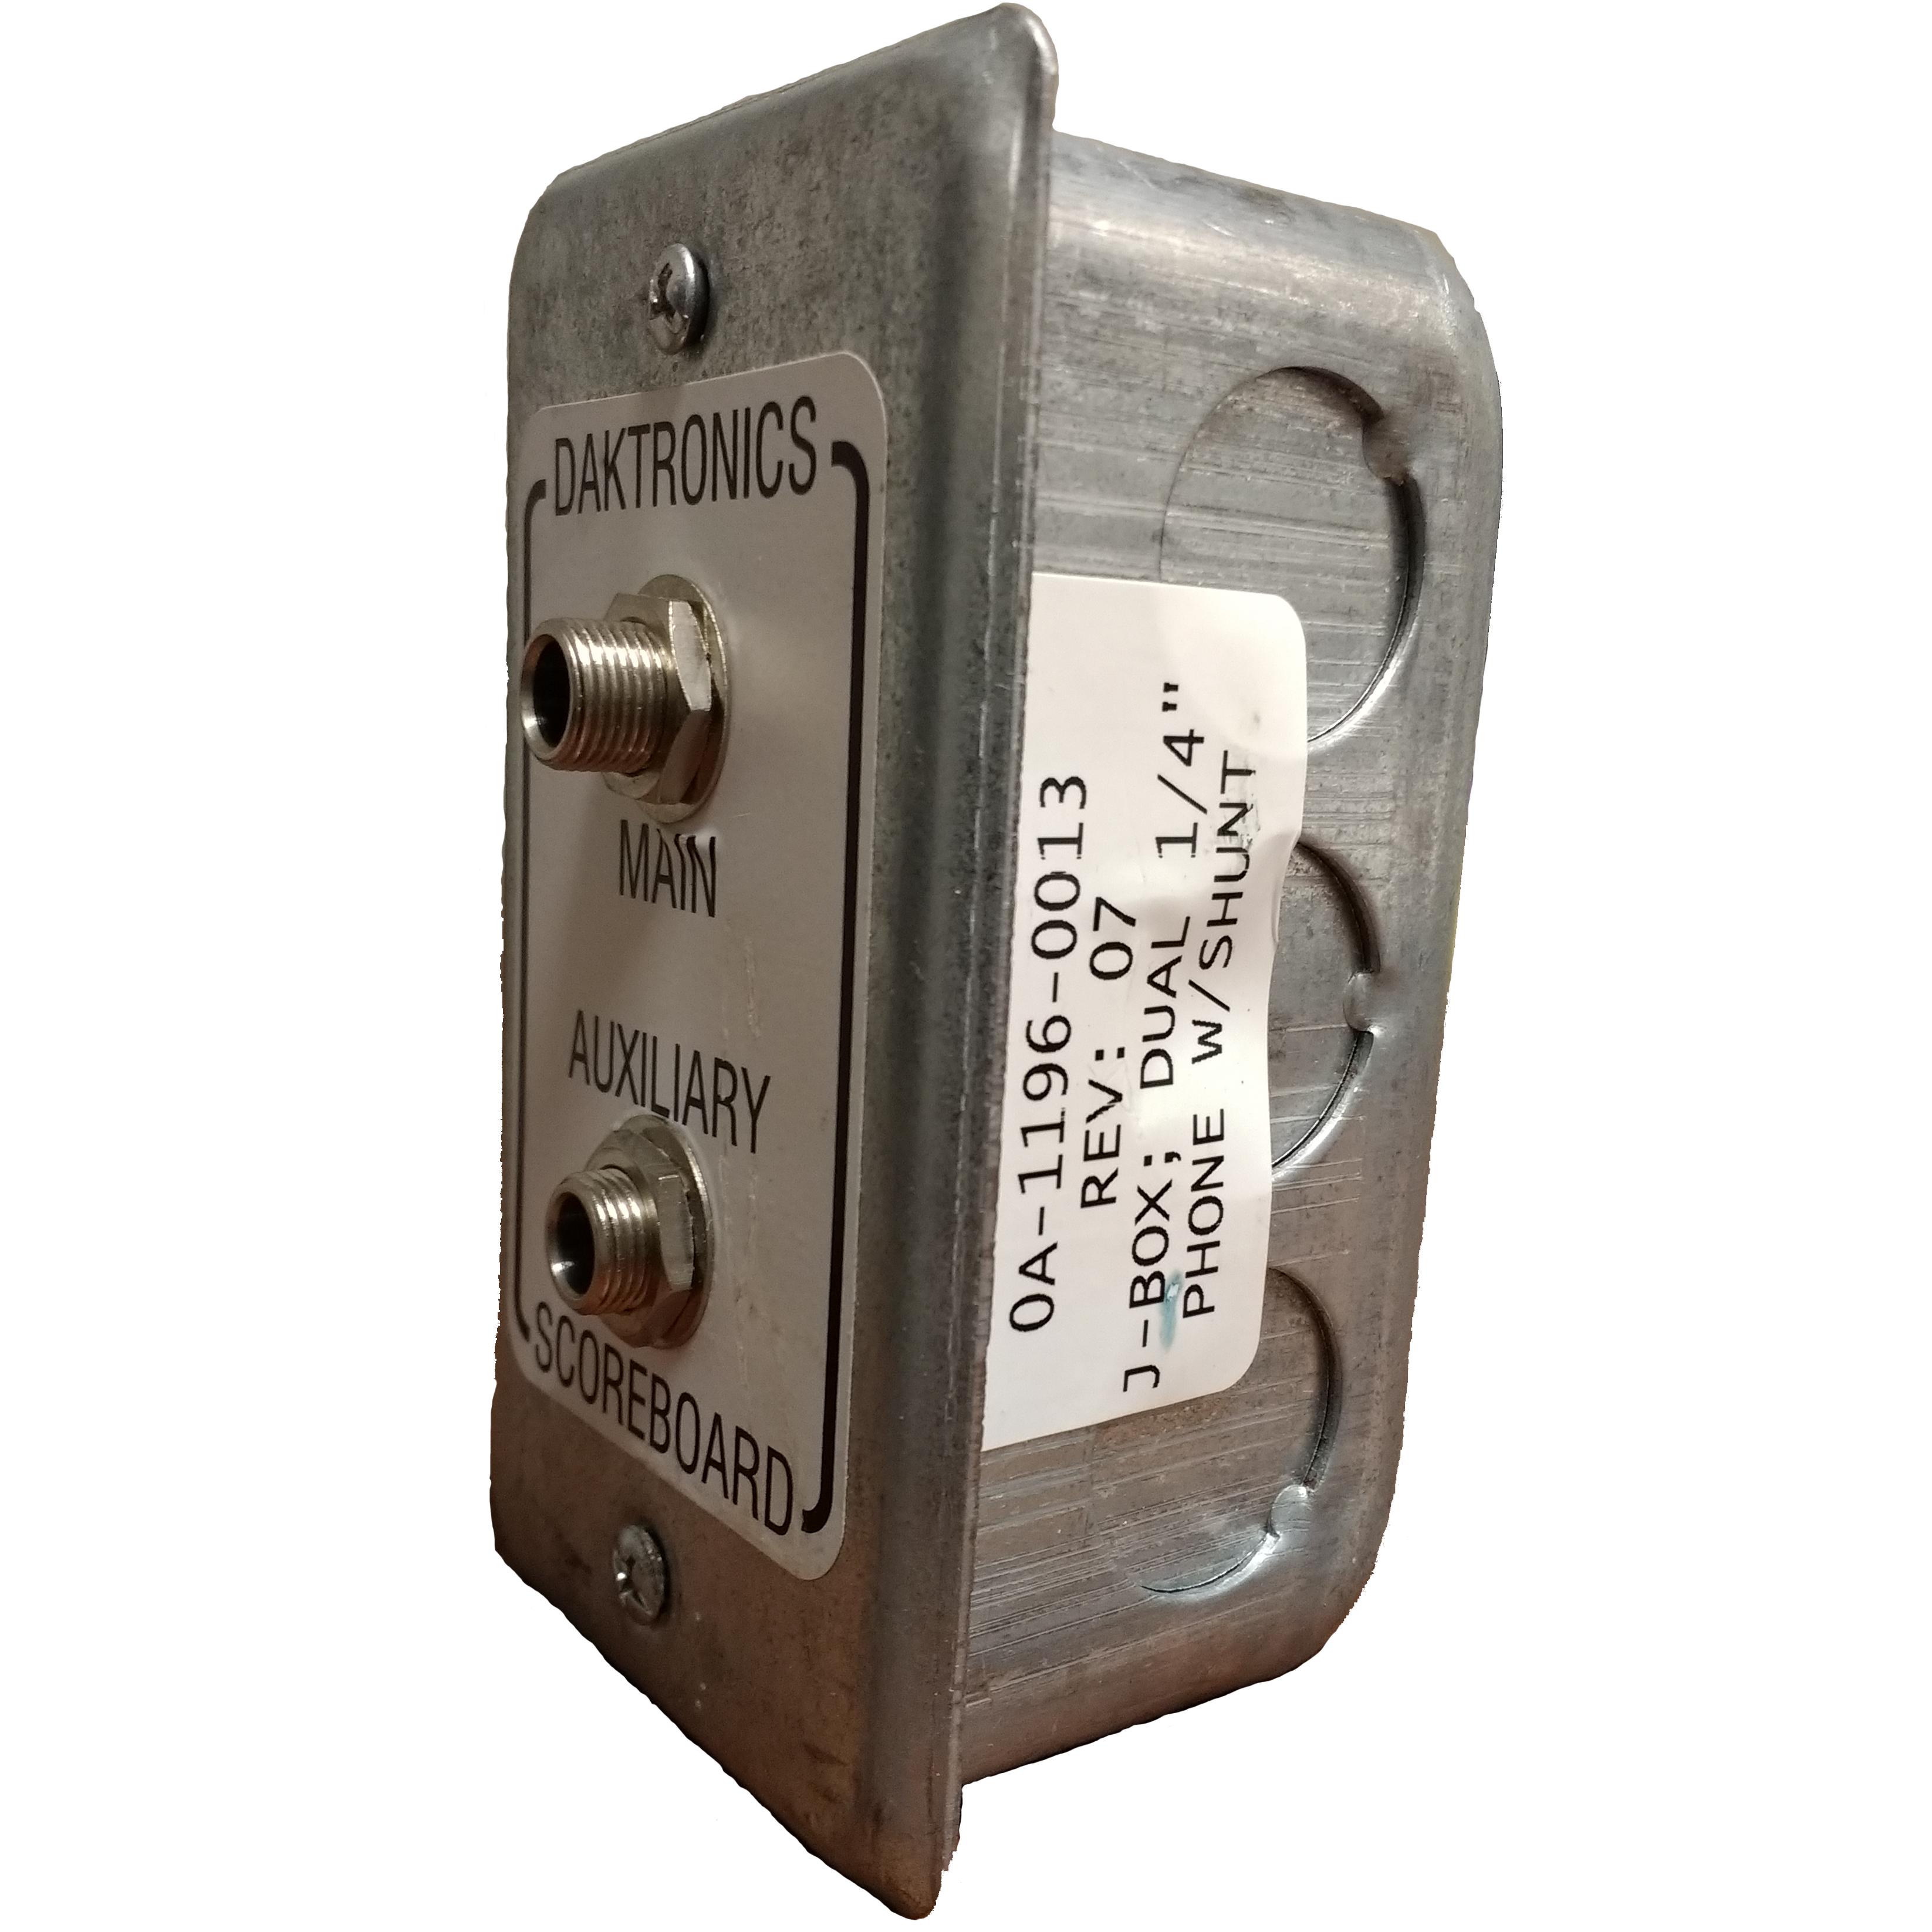 (0A-1196-0013) Daktronics Scoreboard Wired Dual Input J-Box 1